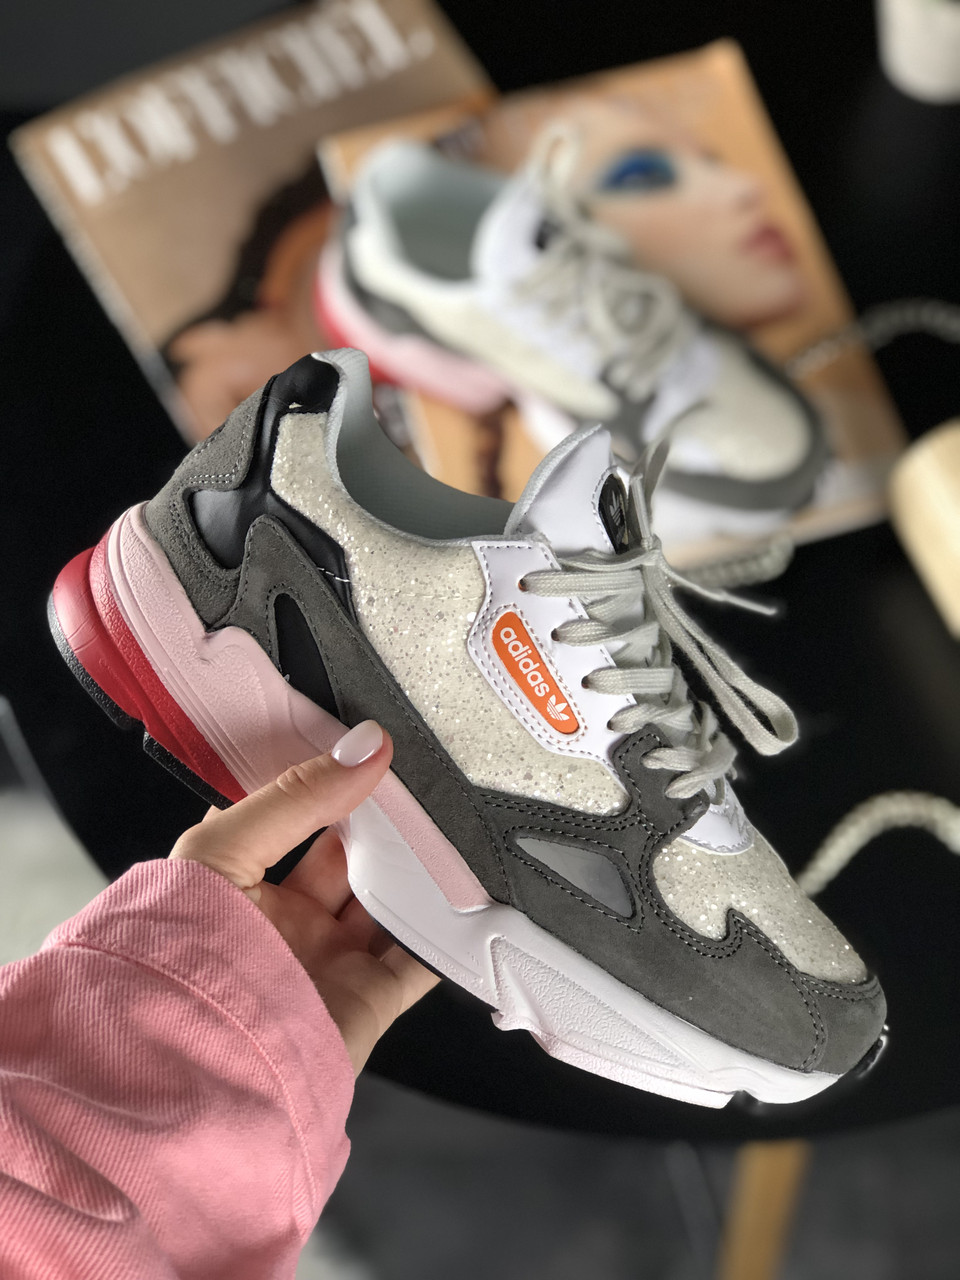 Кроссовки Adidas Falcon White Grey Black Pink